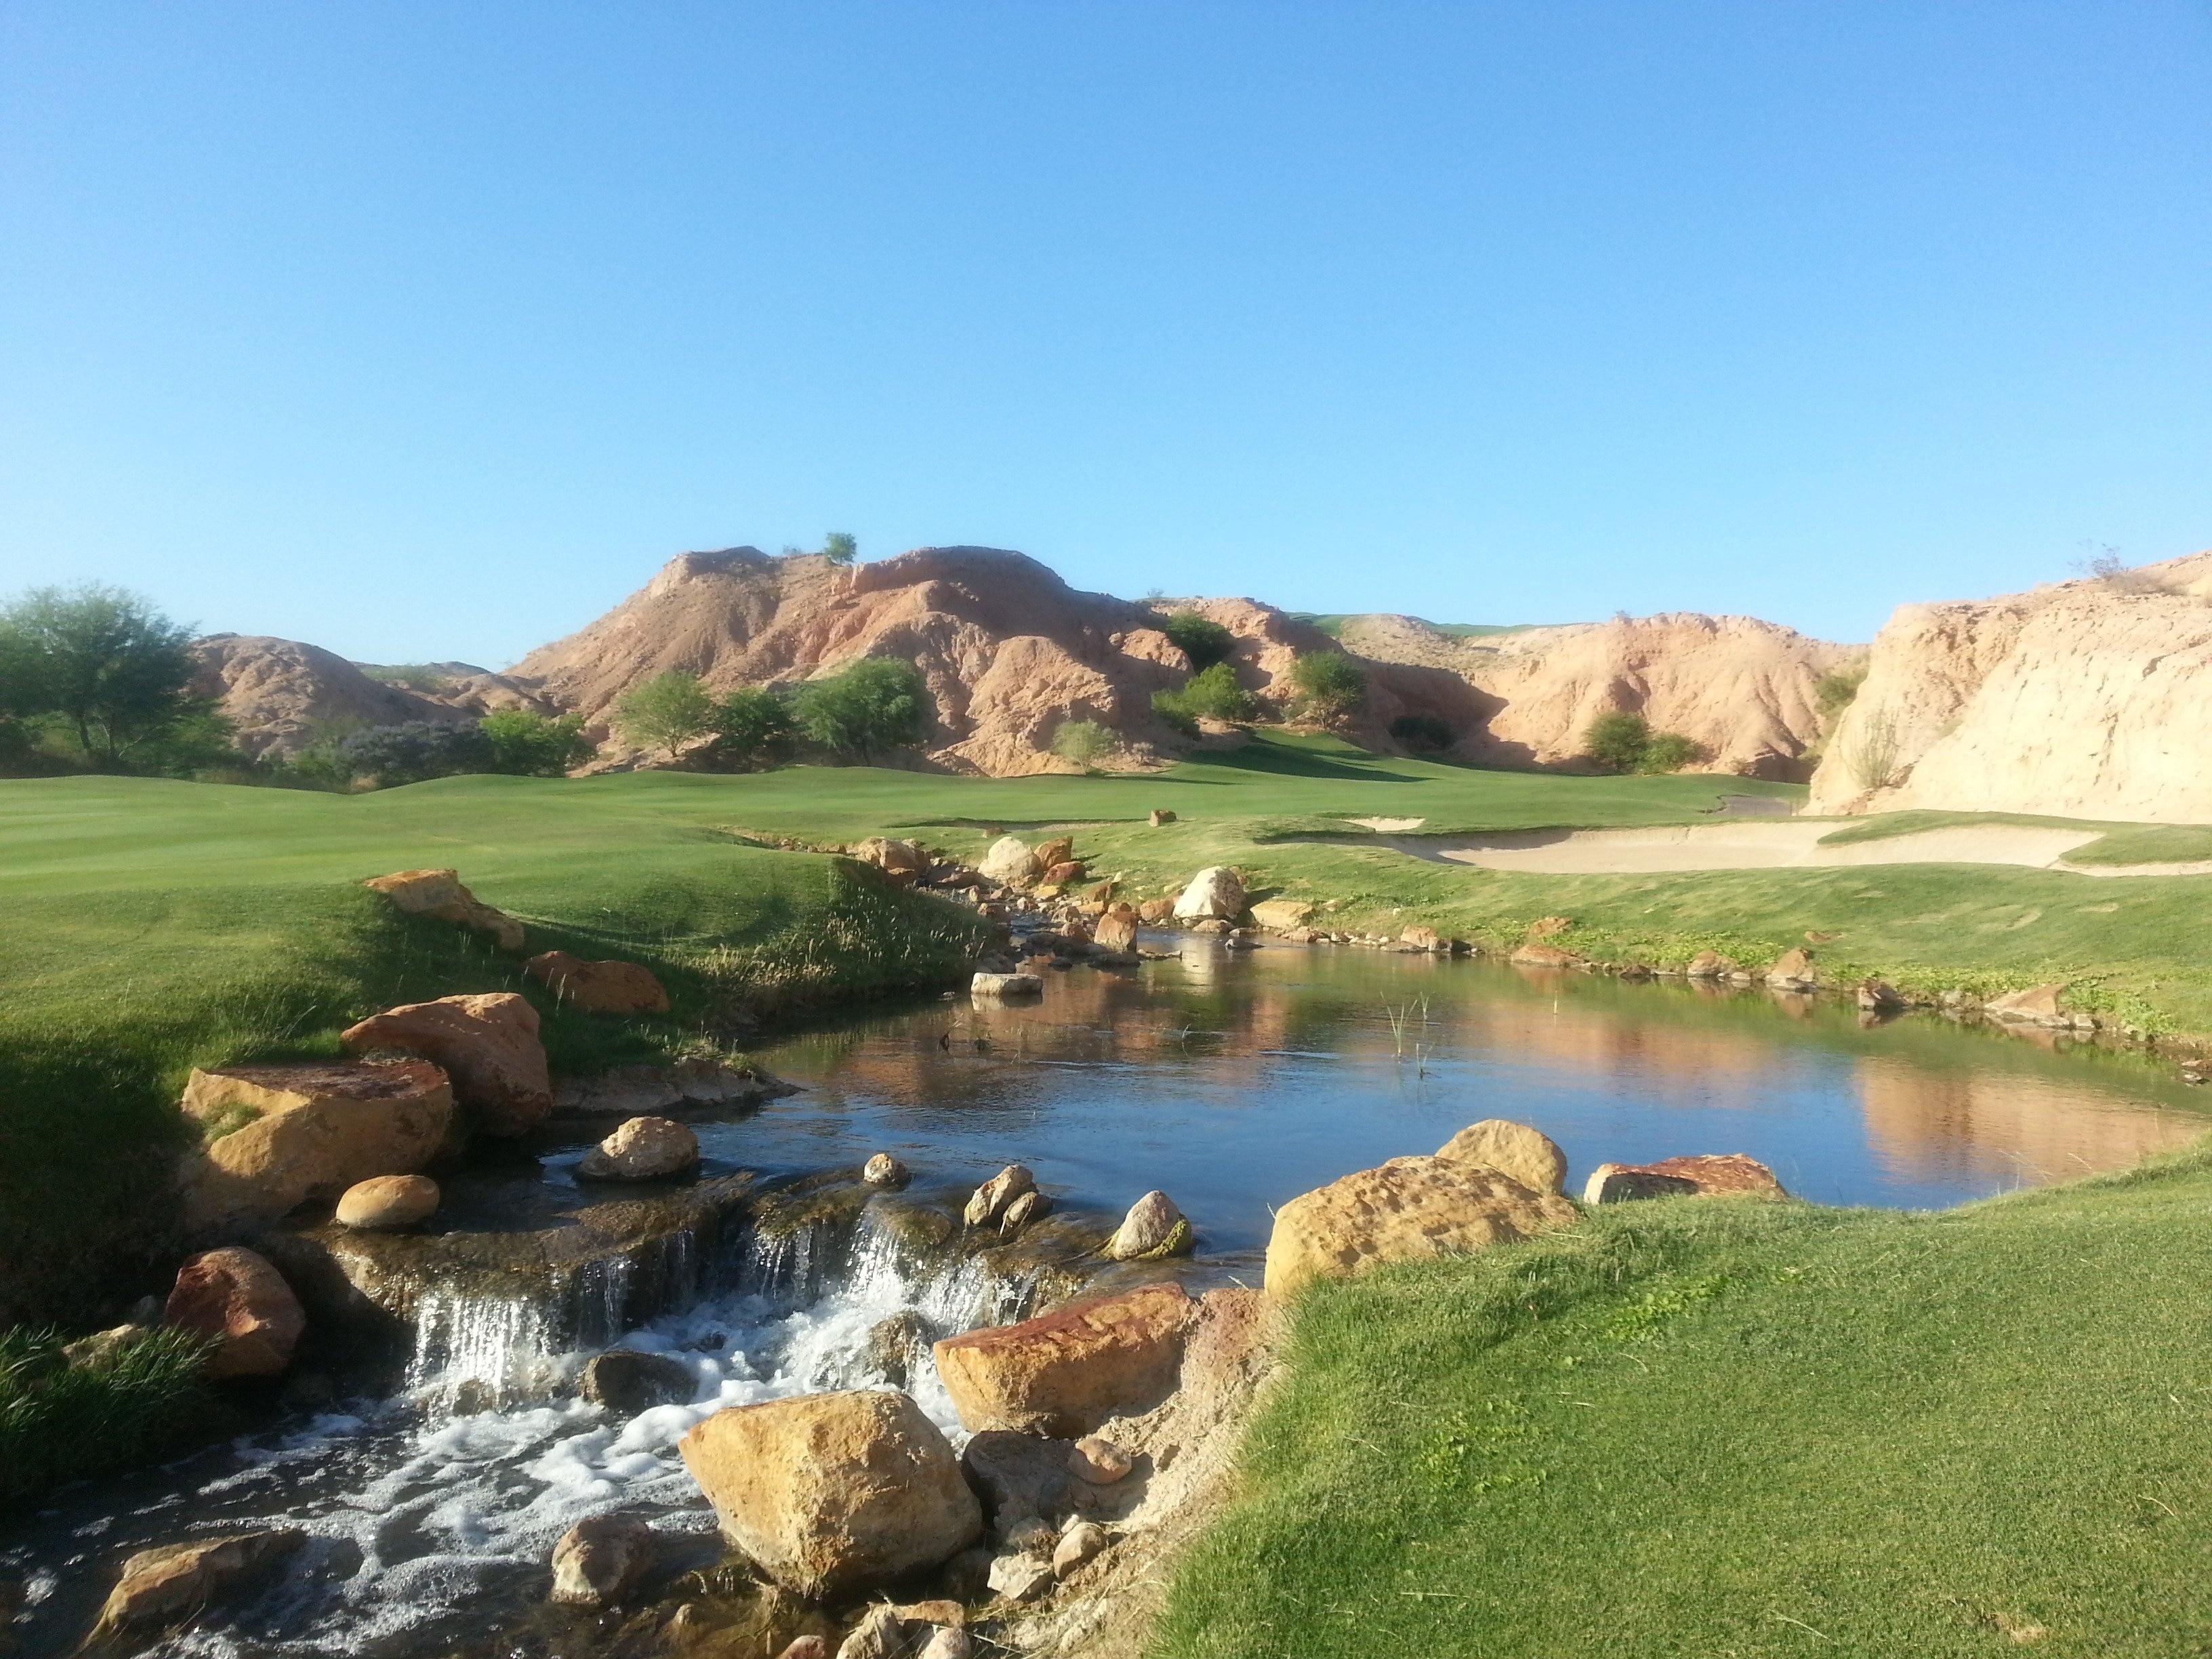 Wolf Creek Golf Club, Mesquite, Nevada, United States of America